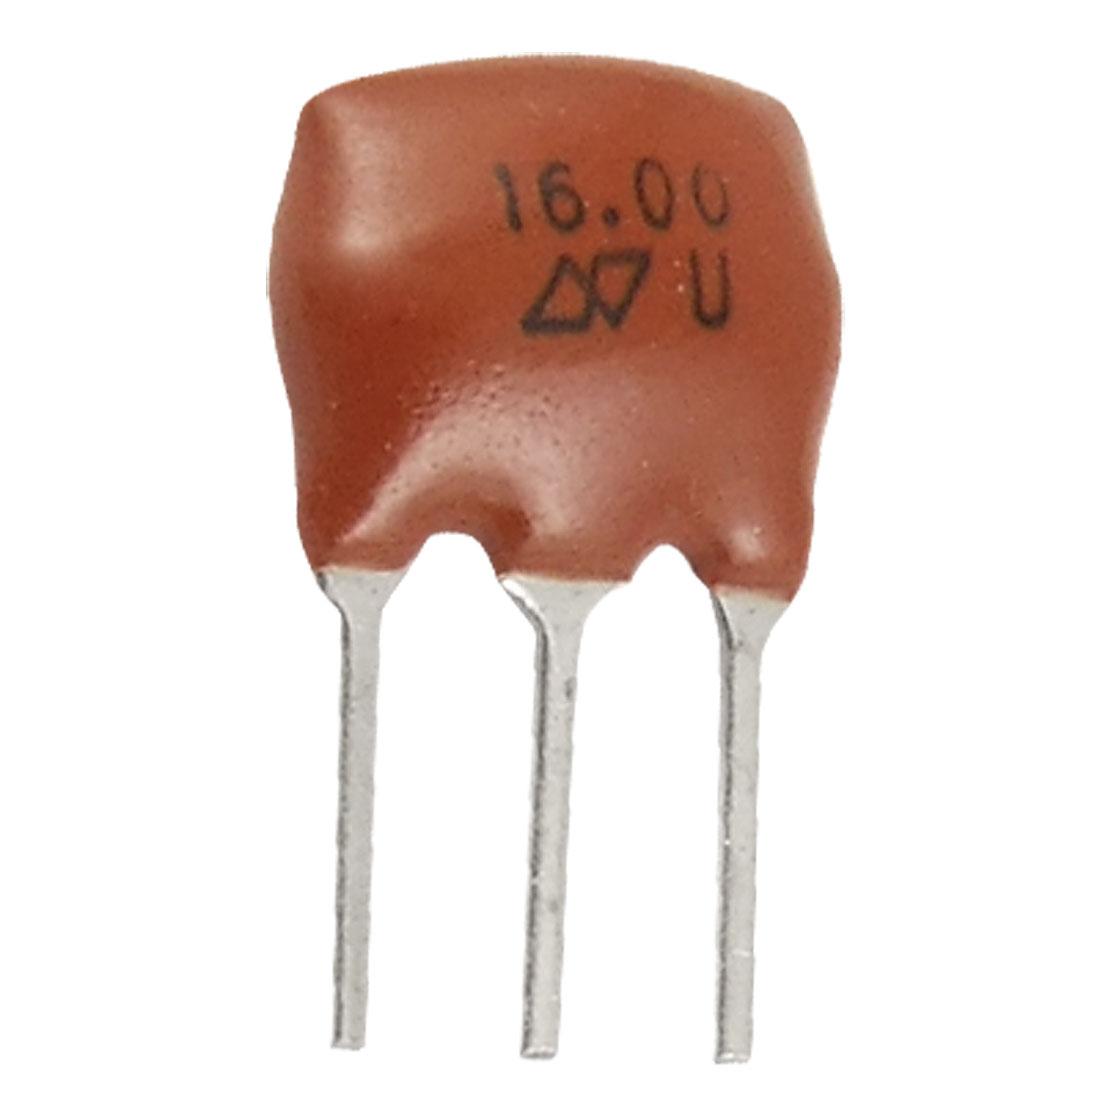 100 Pcs 16 MHz 3 Pins Ceramic Filter for Radio Receiver